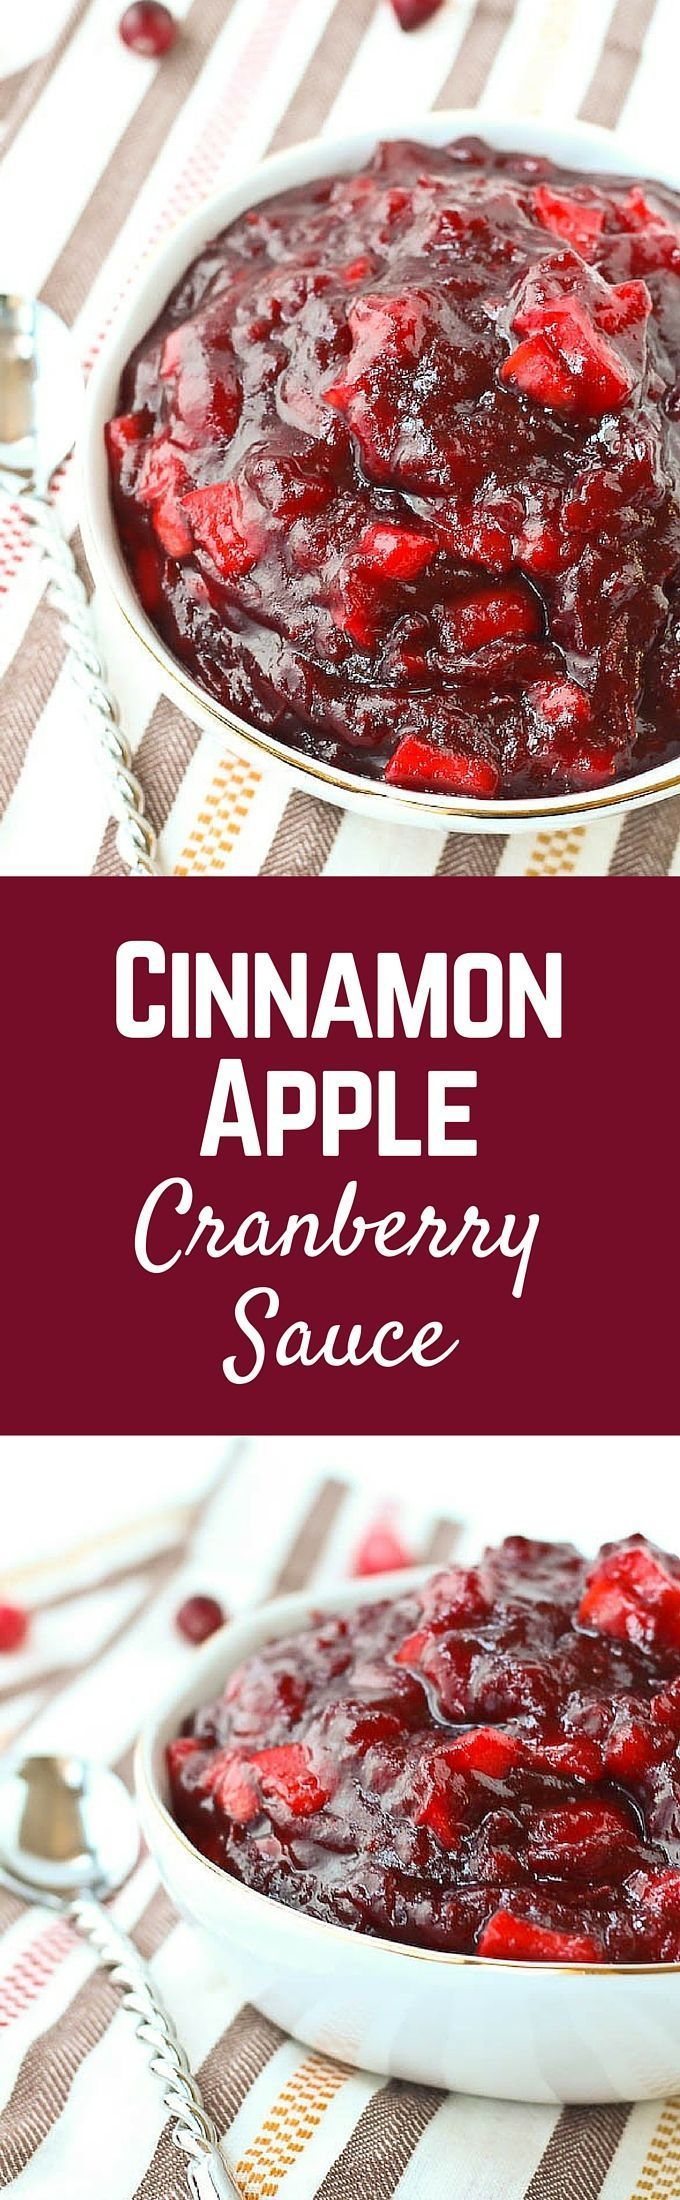 Cinnamon Apple Cranberry Sauce